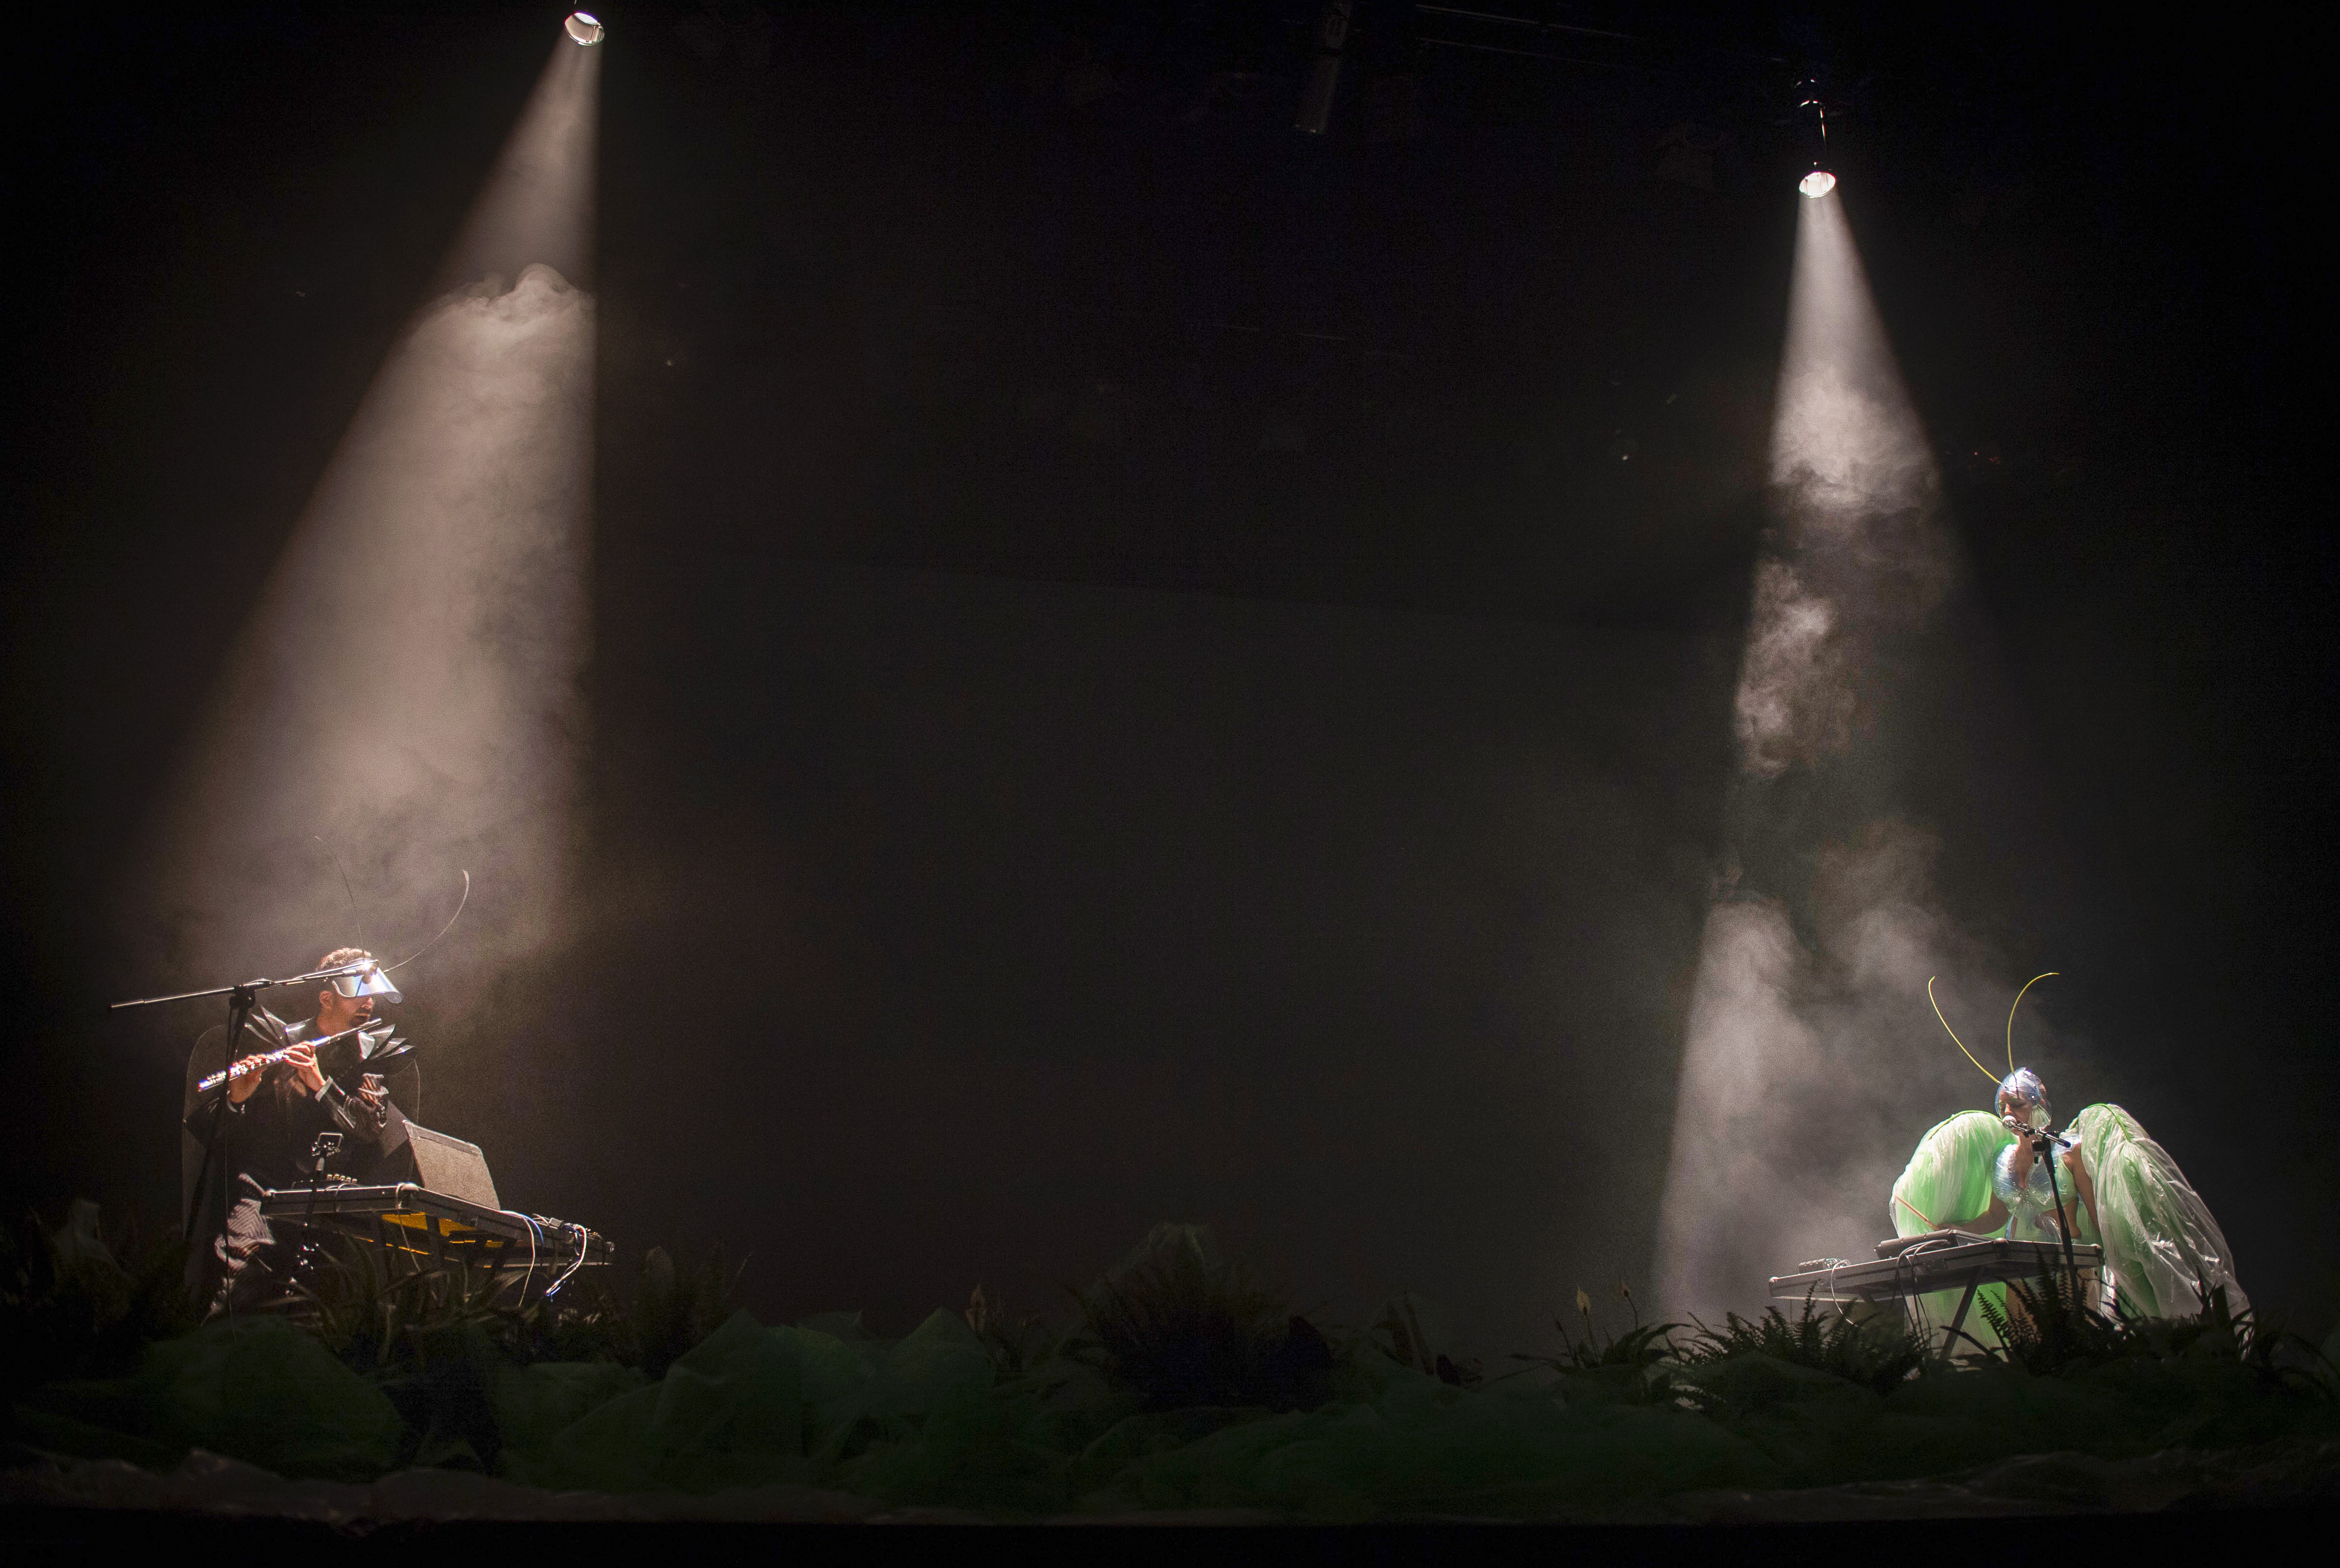 El Mercat de Música Viva de Vic vuelve a la presencialidad